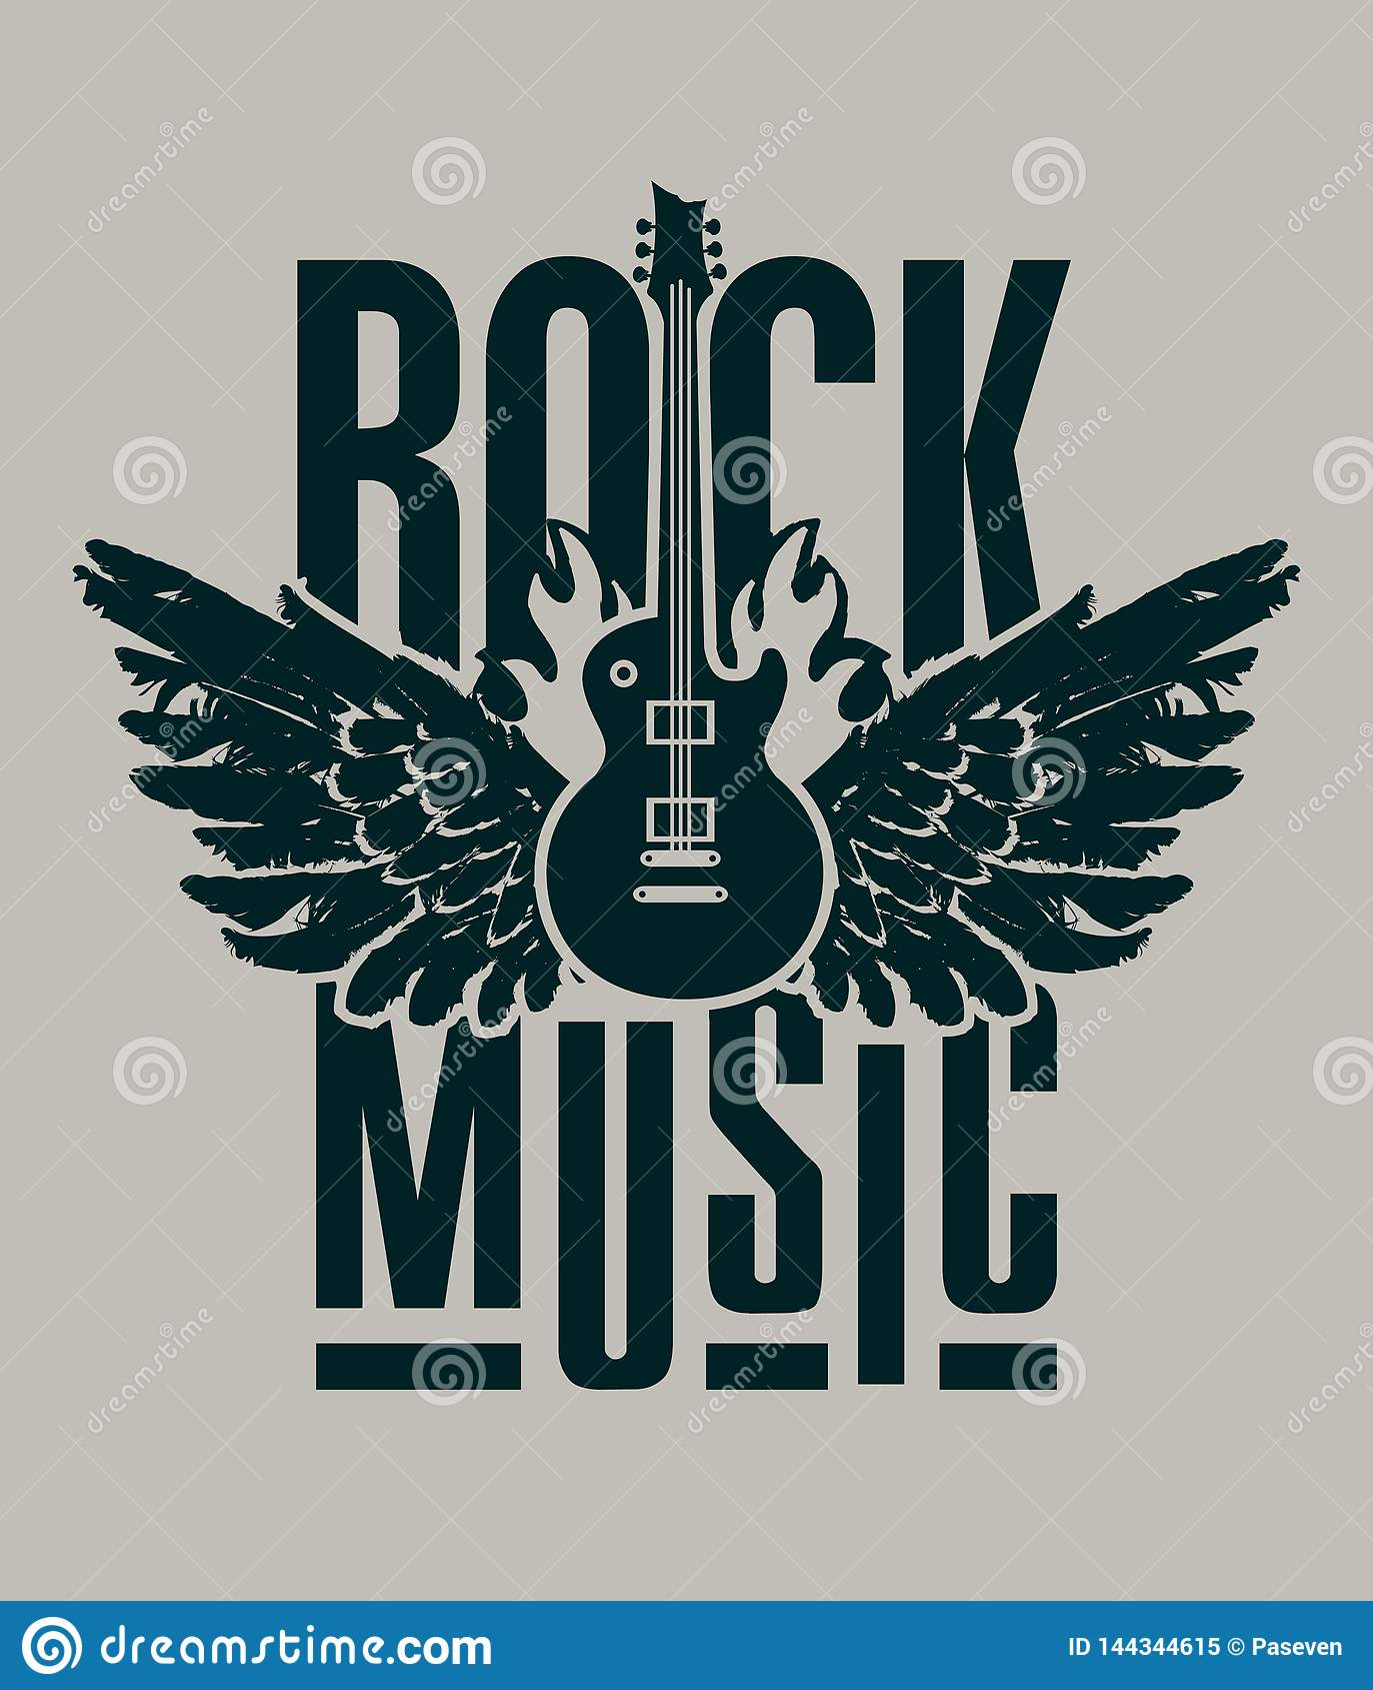 banner for rock music